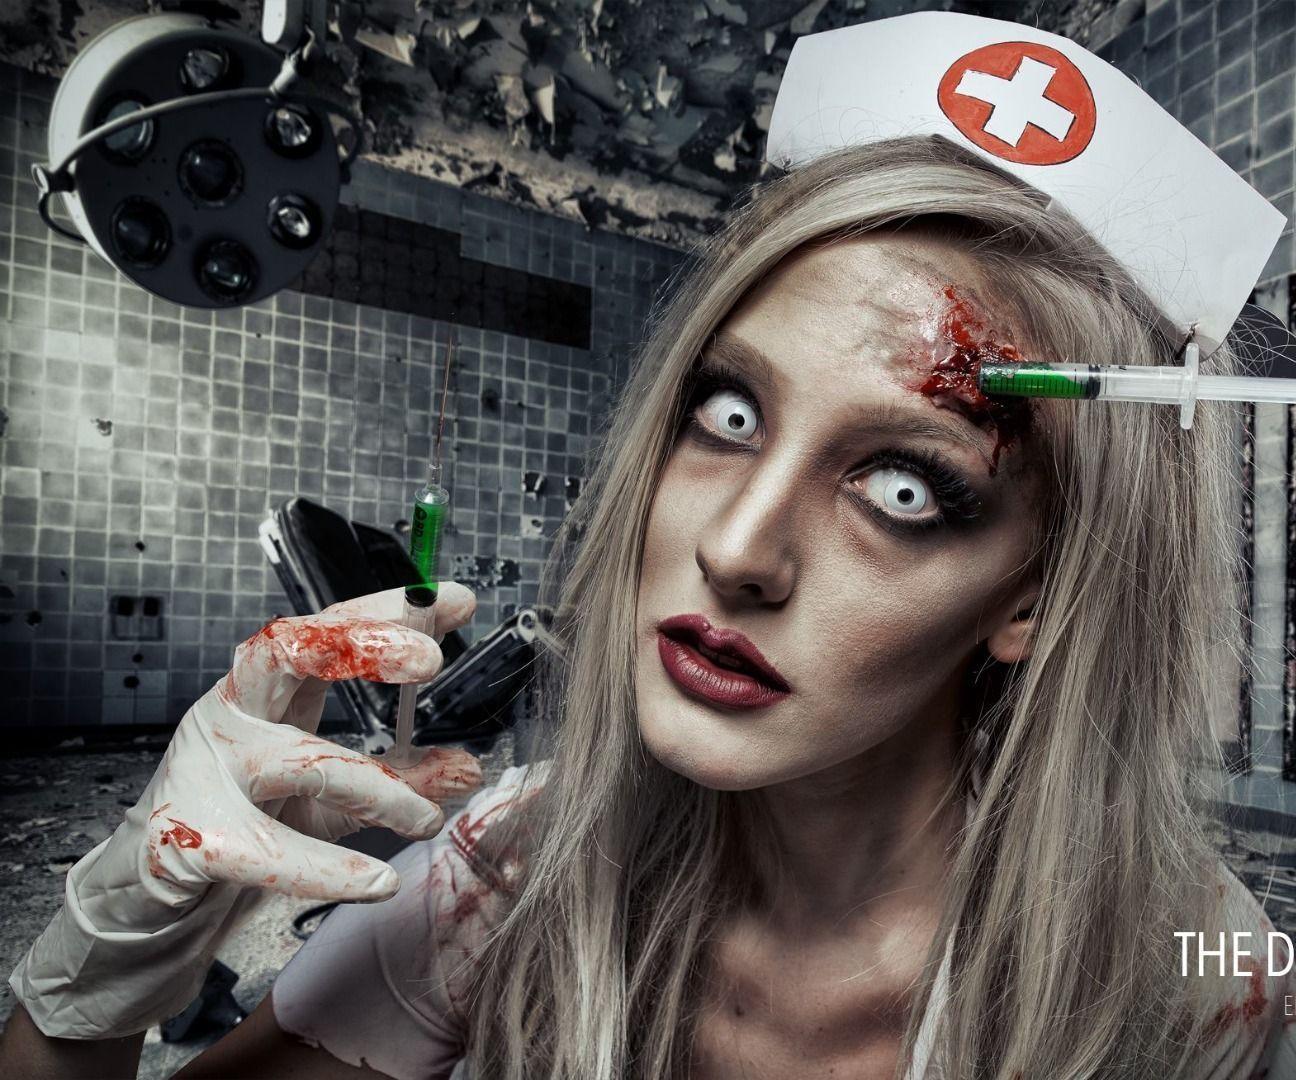 Dead nurse sfx makeup tutorial sfx makeup make up and fx makeup dead nurse sfx makeup tutorial baditri Gallery